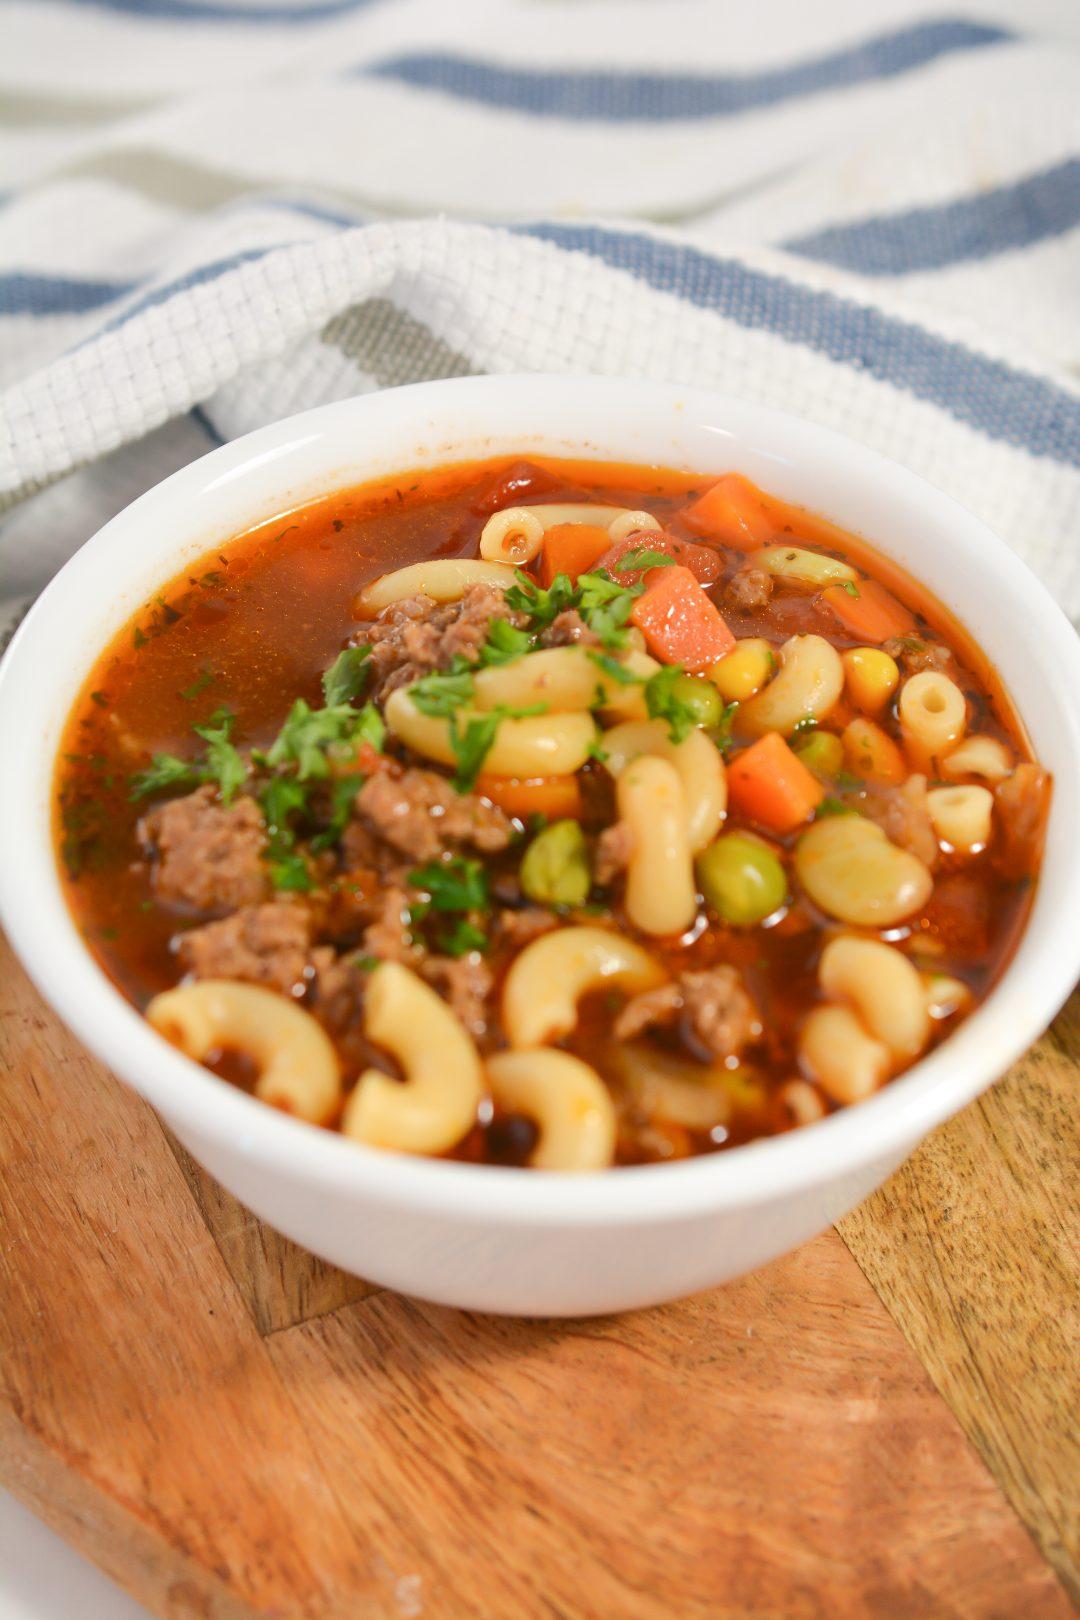 Beef and Macaroni Soup